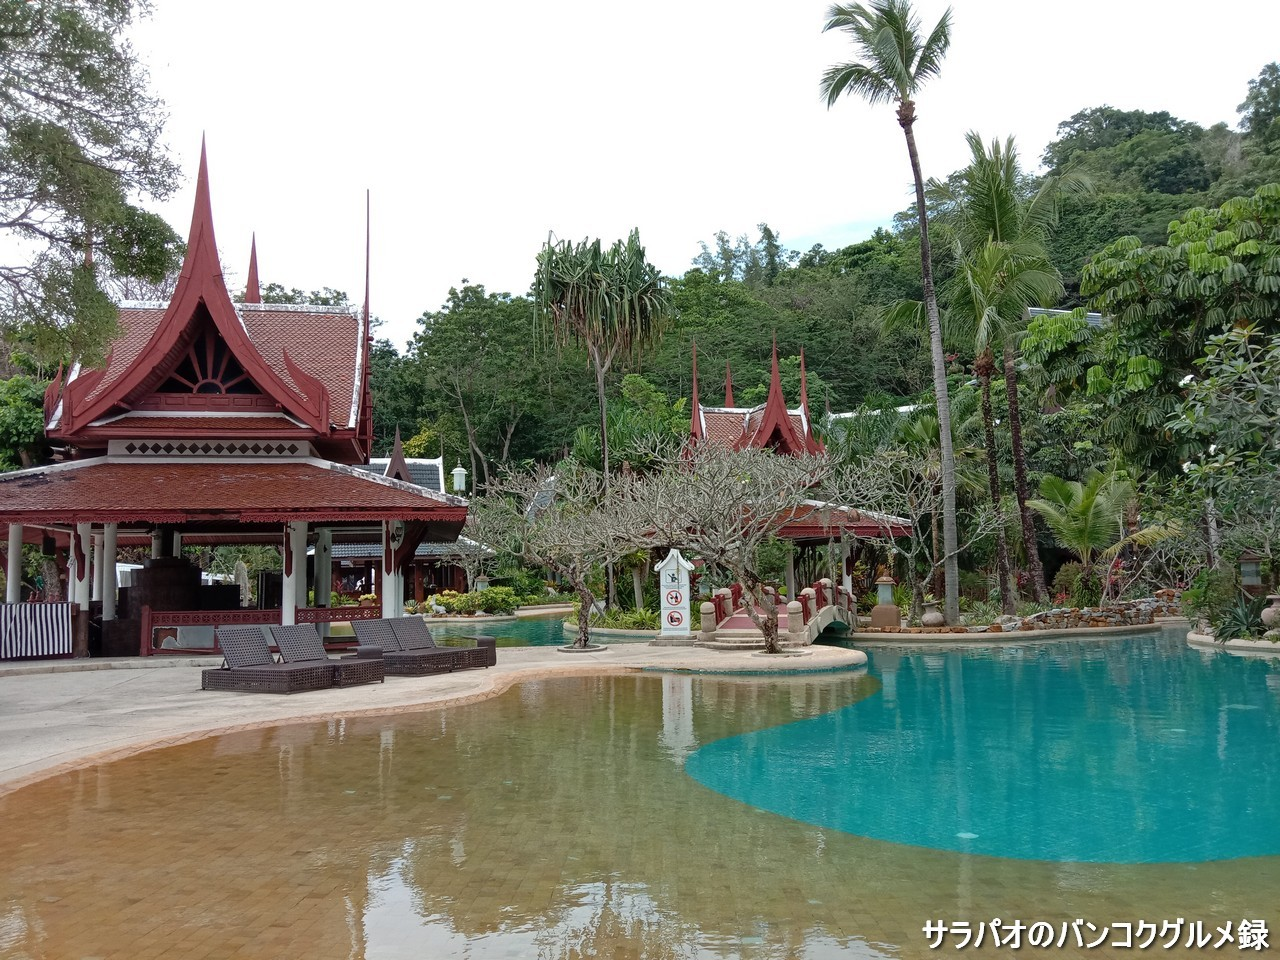 Thavorn Beach Village Resort & Spaは4平方kmの巨大プールがあるリゾート in プーケット